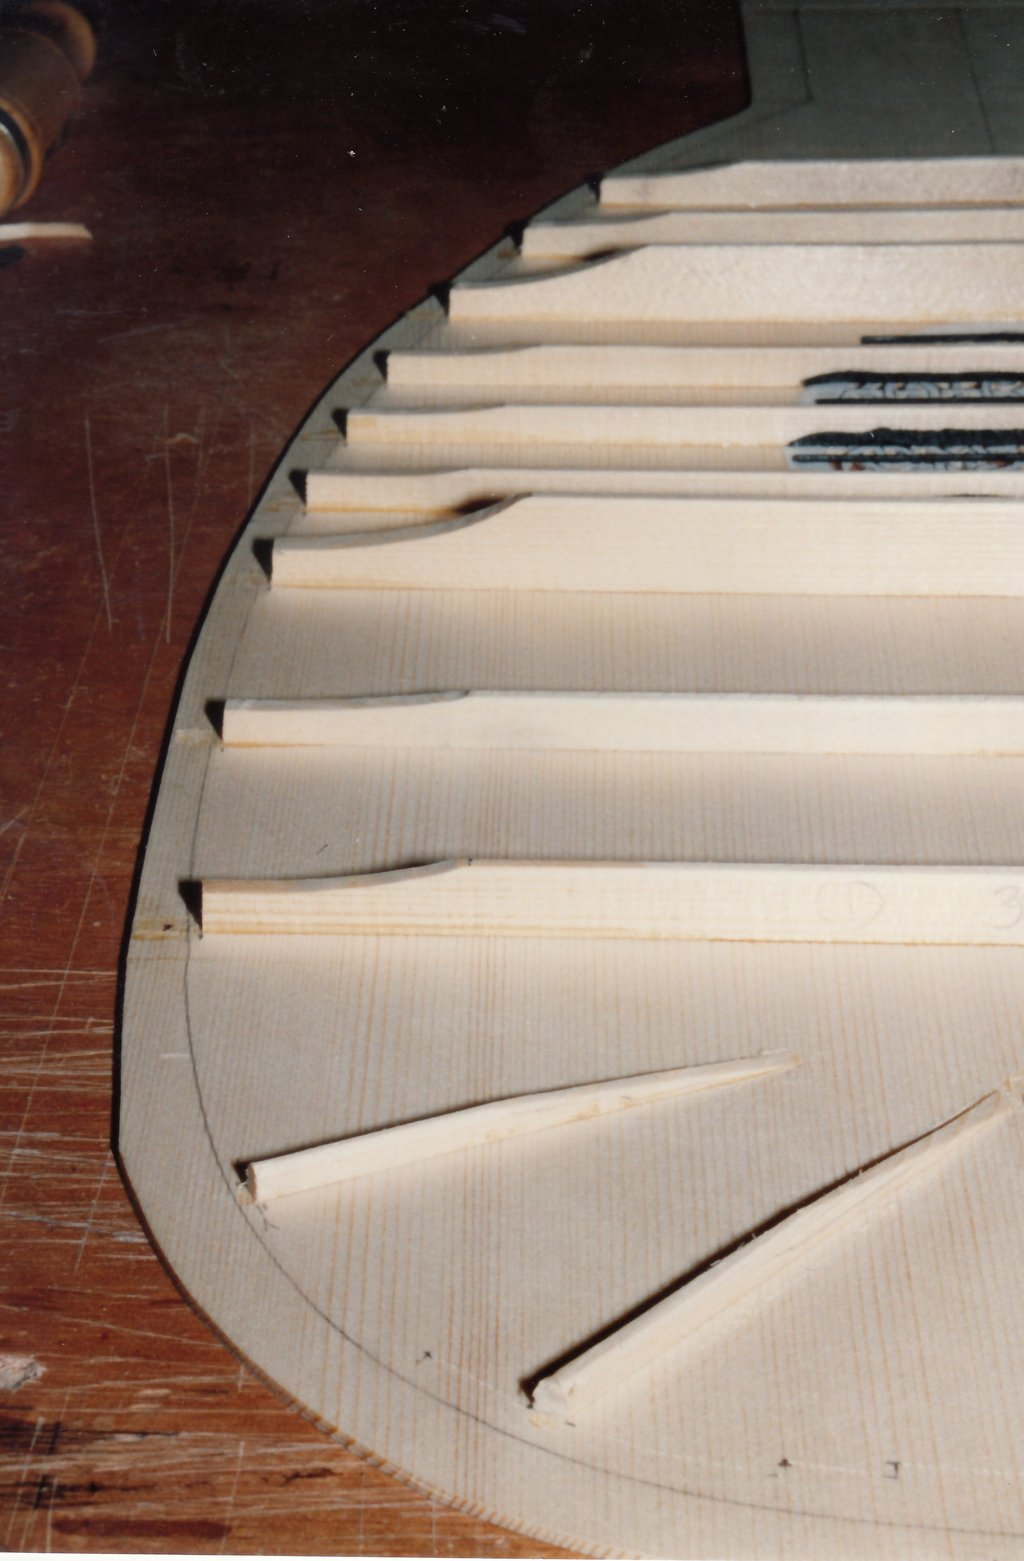 Fabrication d'instruments de musique anciens de bgire 19111306423523134916508232